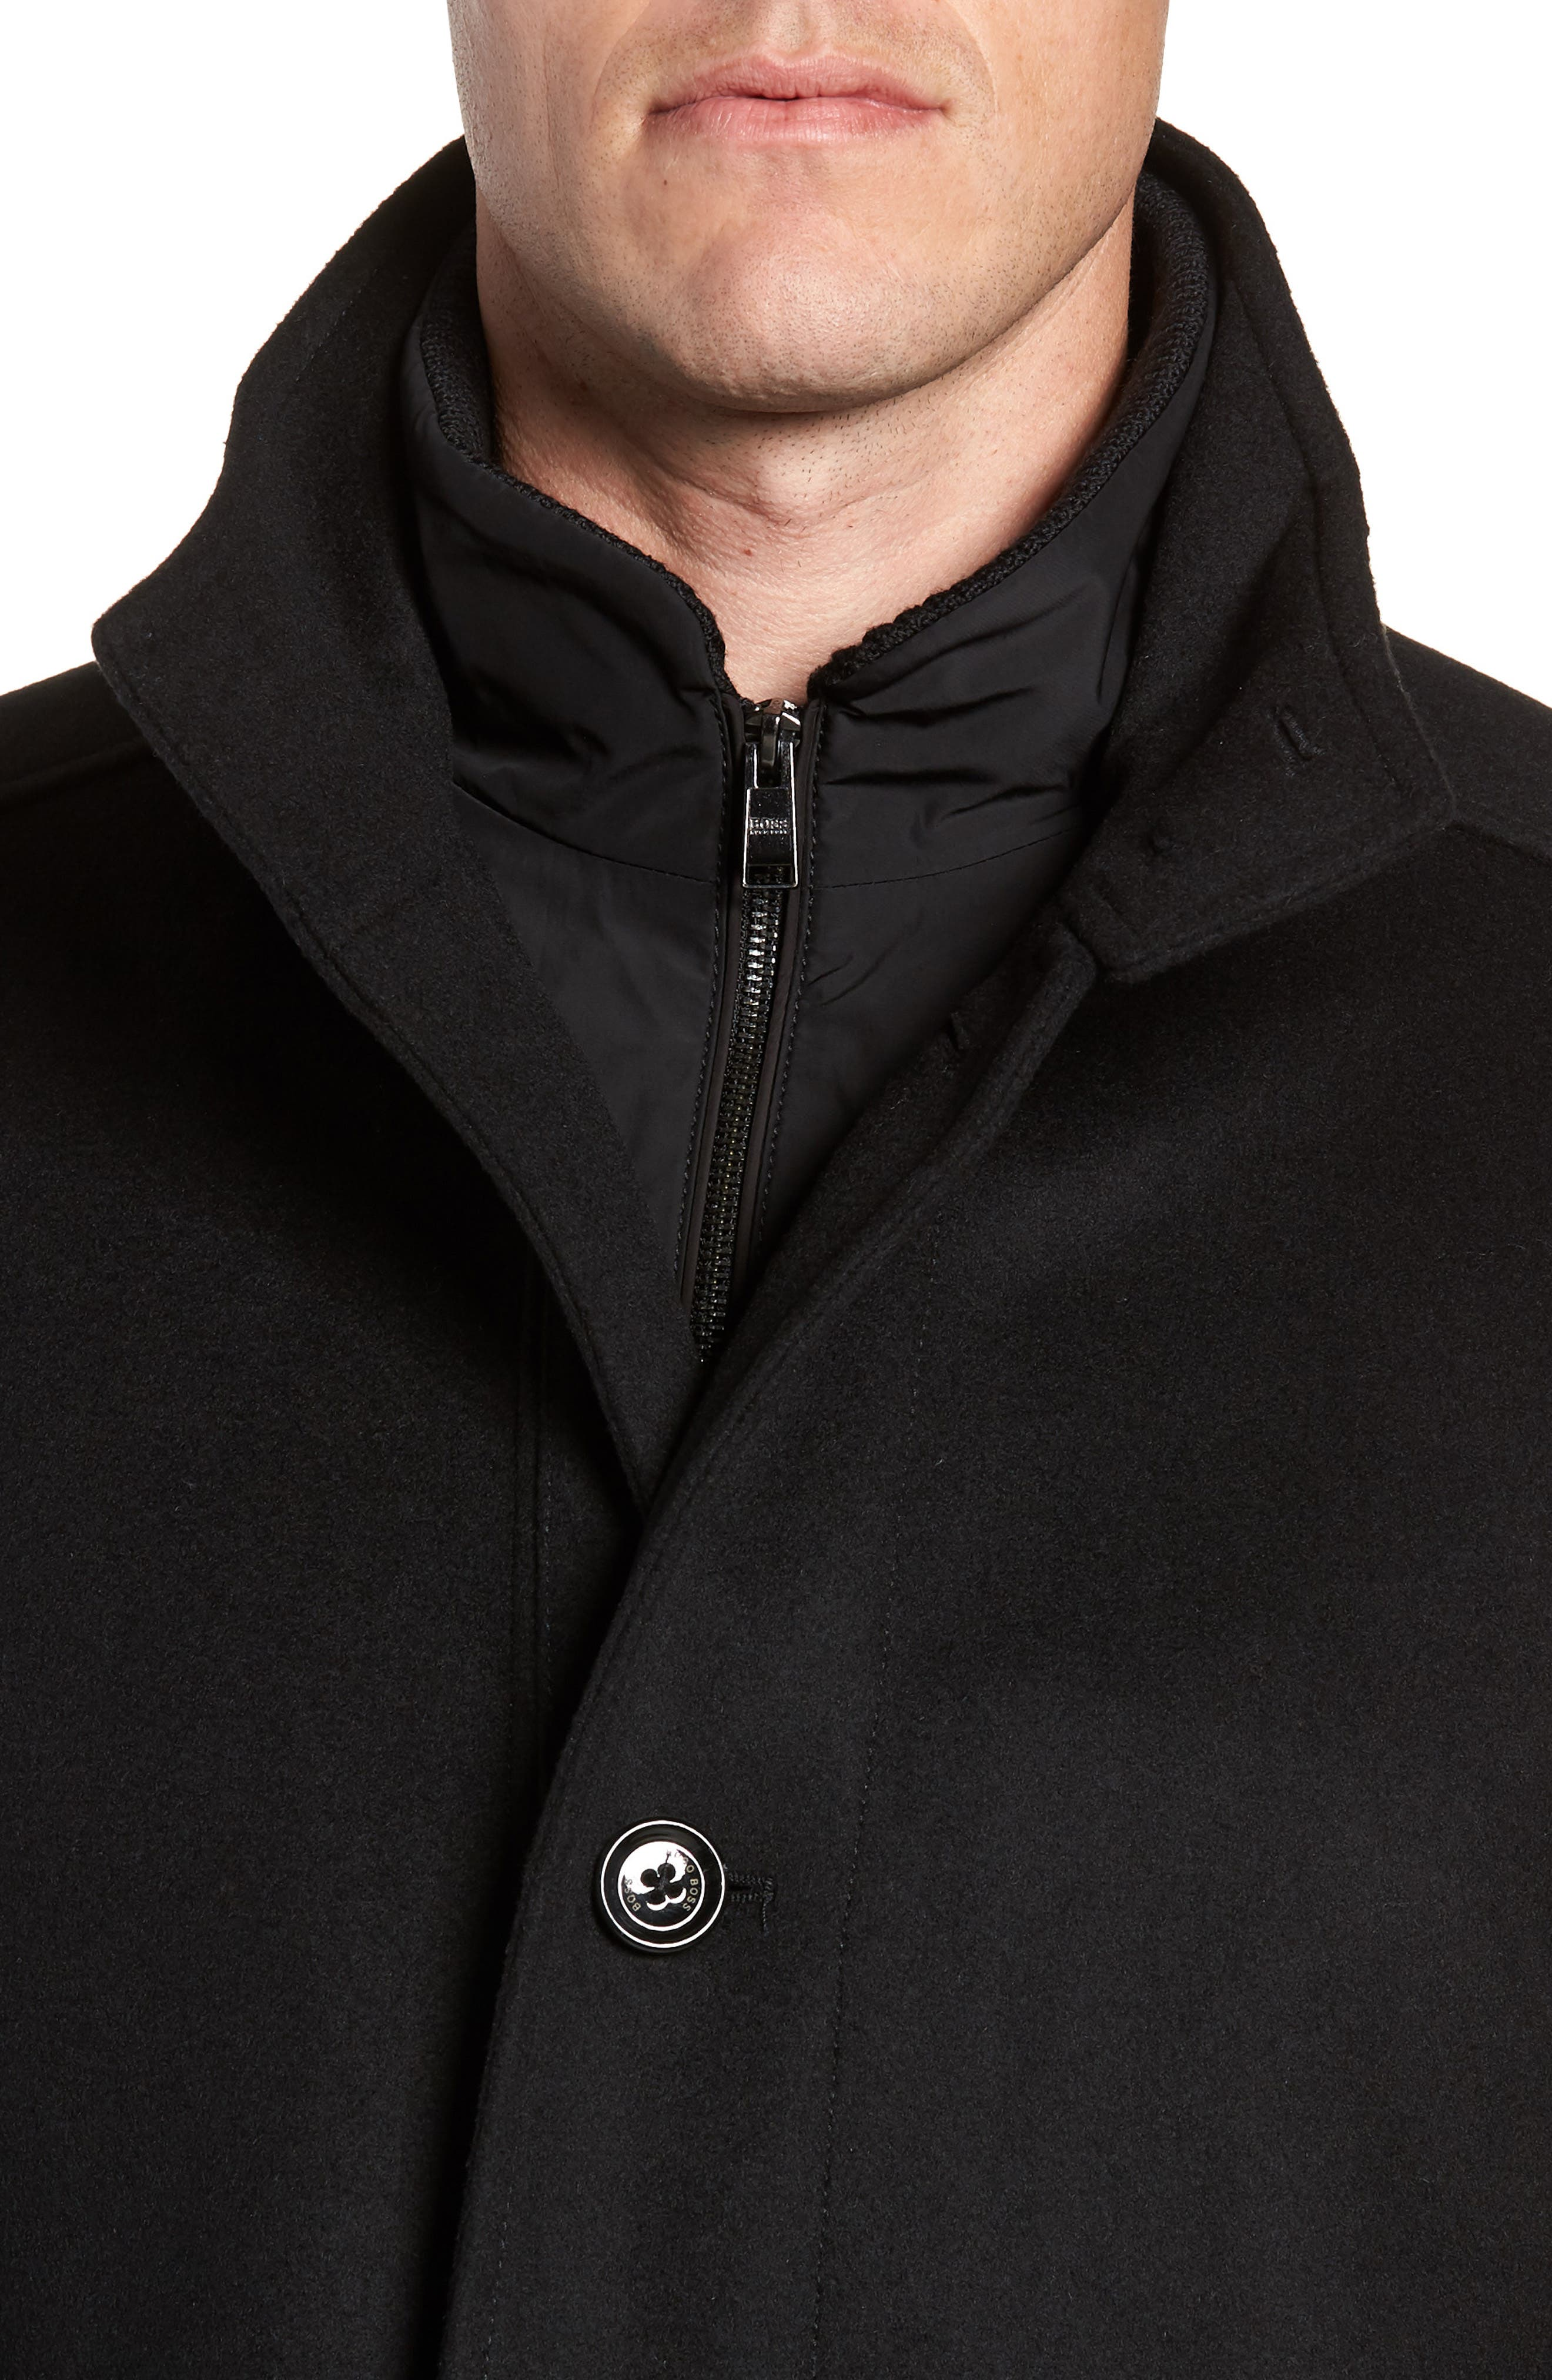 Coxtan Wool Regular Fit Car Coat,                             Alternate thumbnail 4, color,                             BLACK